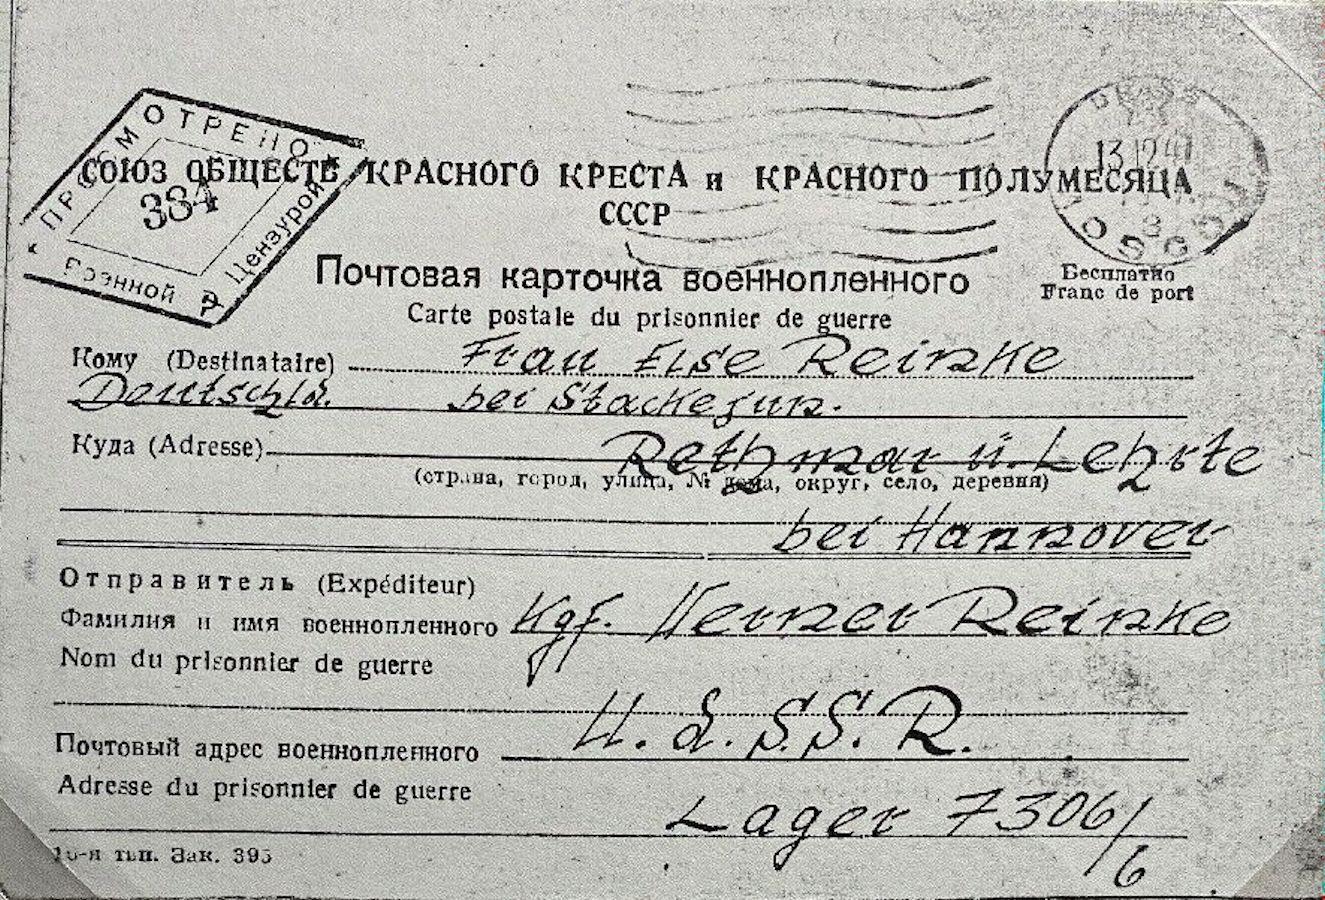 1947;Russia;Printed, hand colored, or both? ; WW II-Era Christmas POW Card